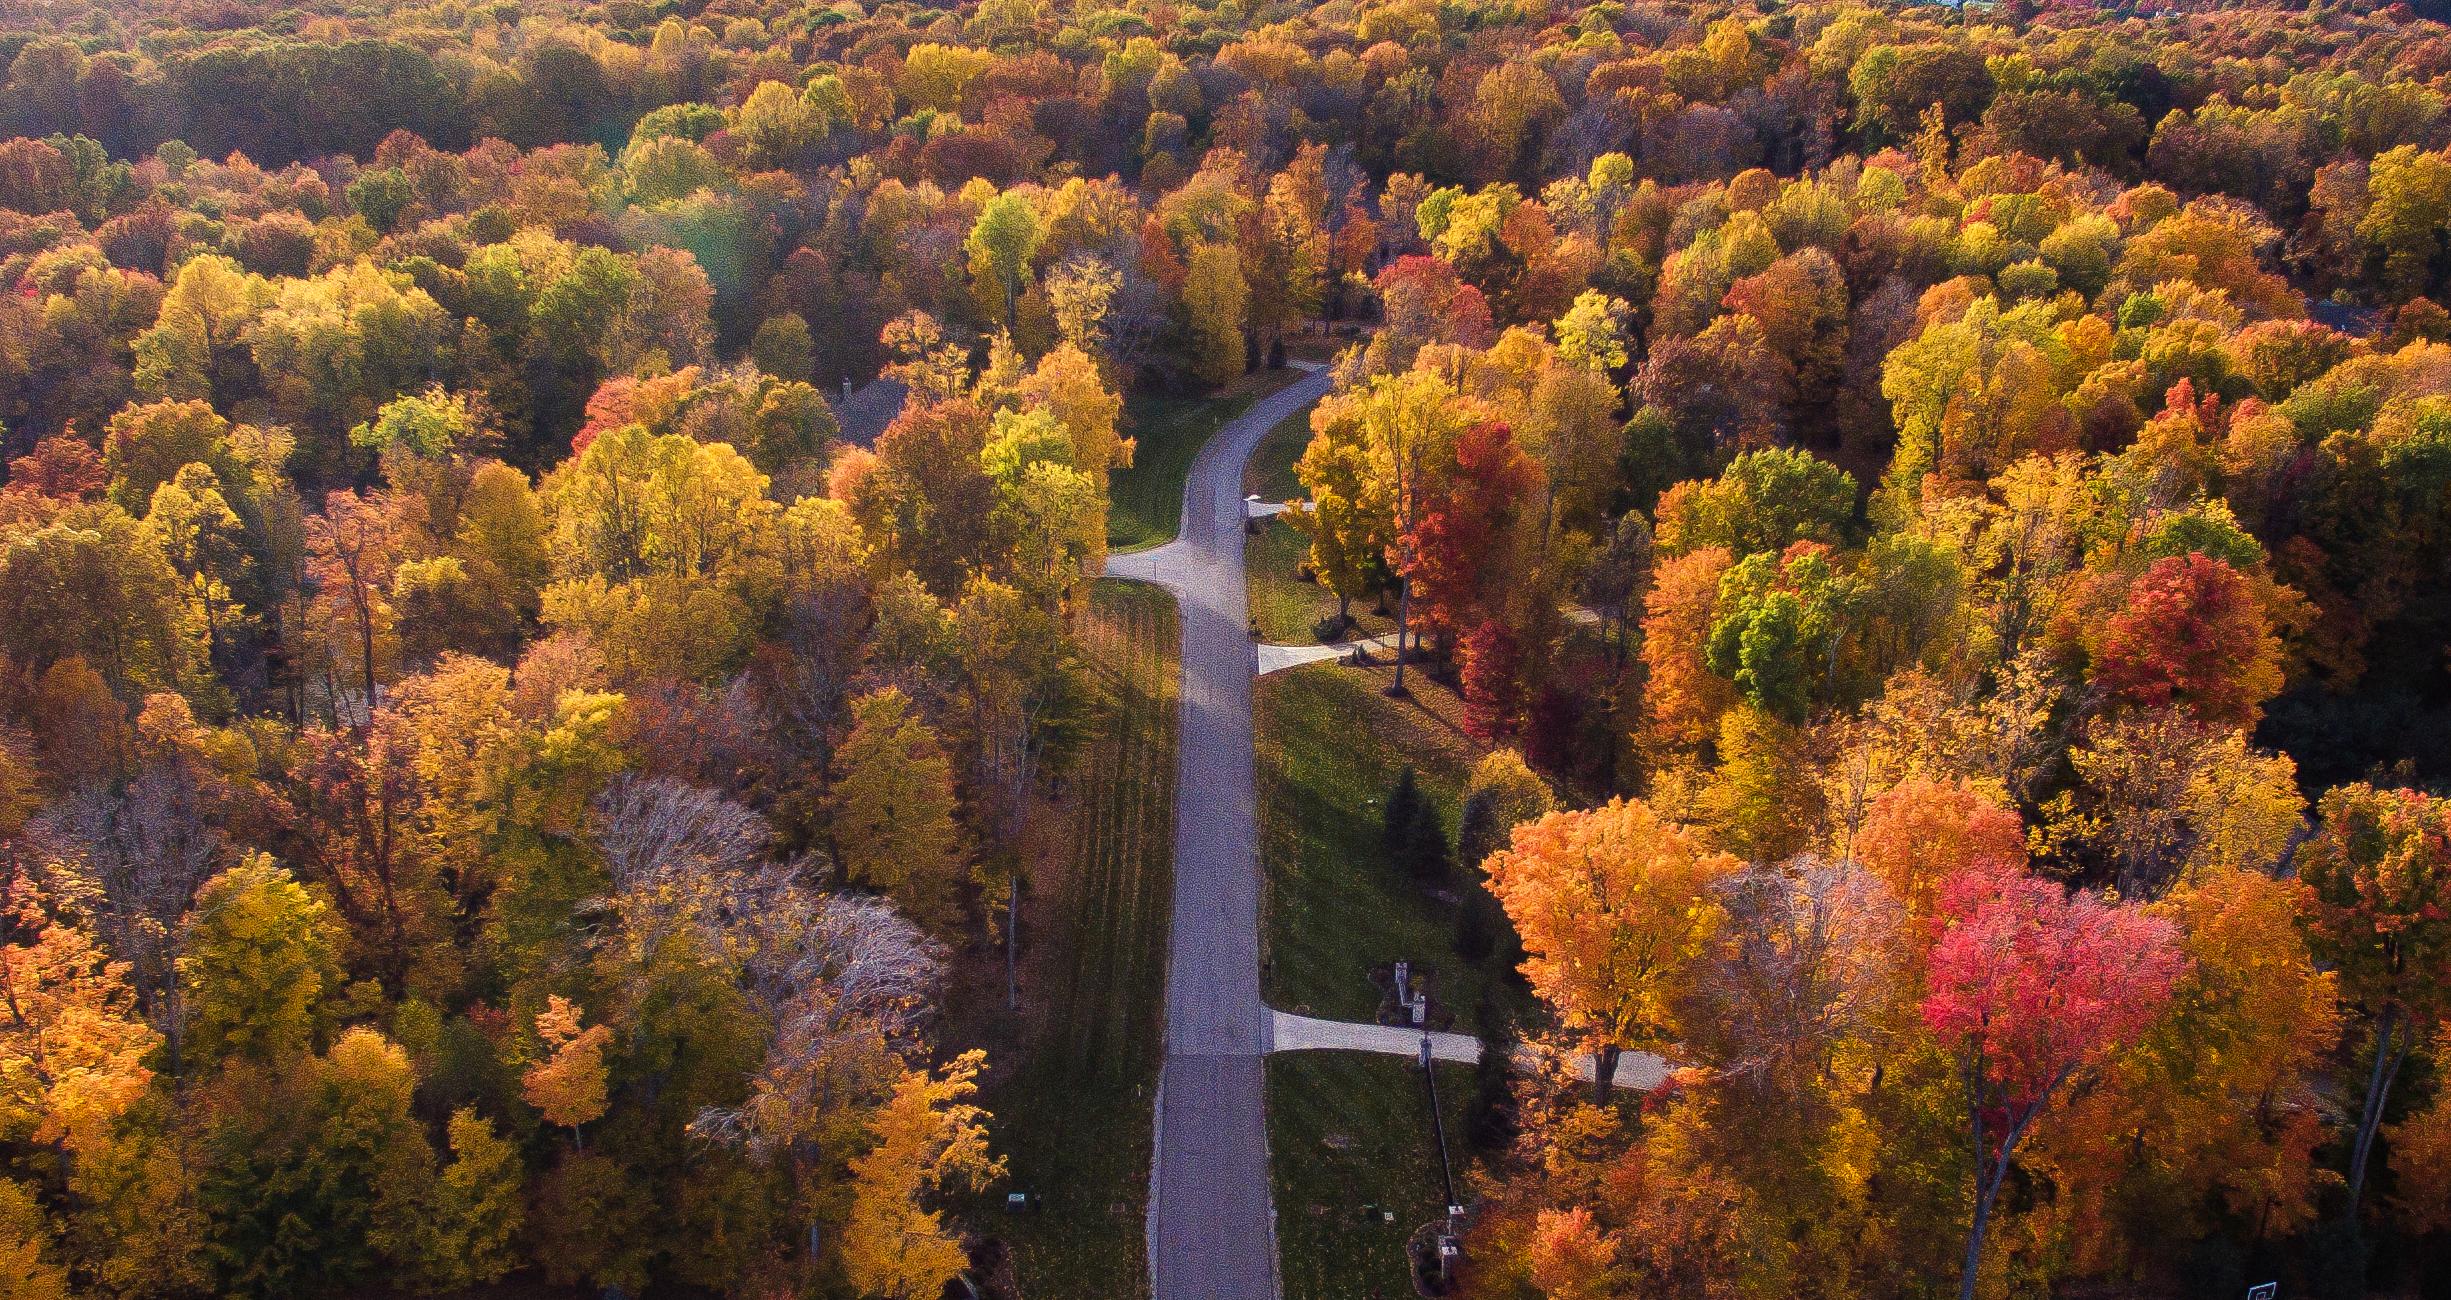 Sharon Township, Ohio